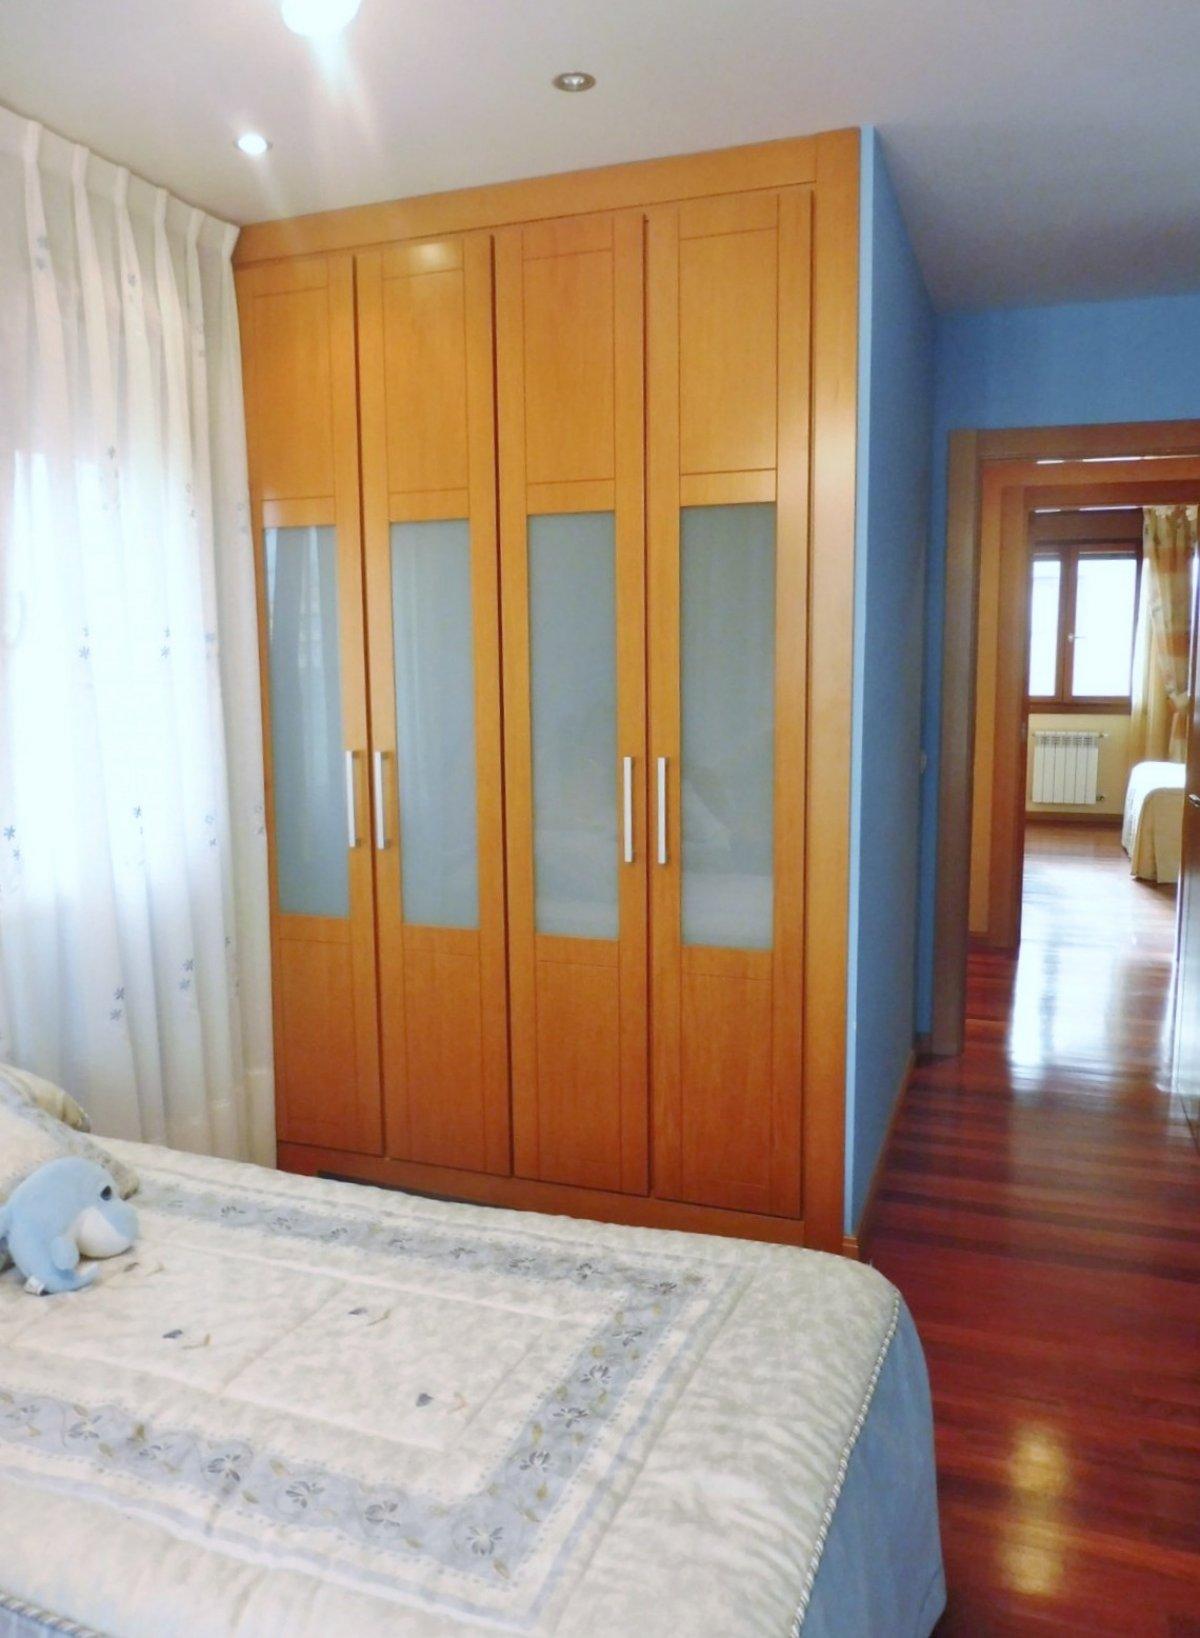 Bonito piso seminuevo - imagenInmueble15